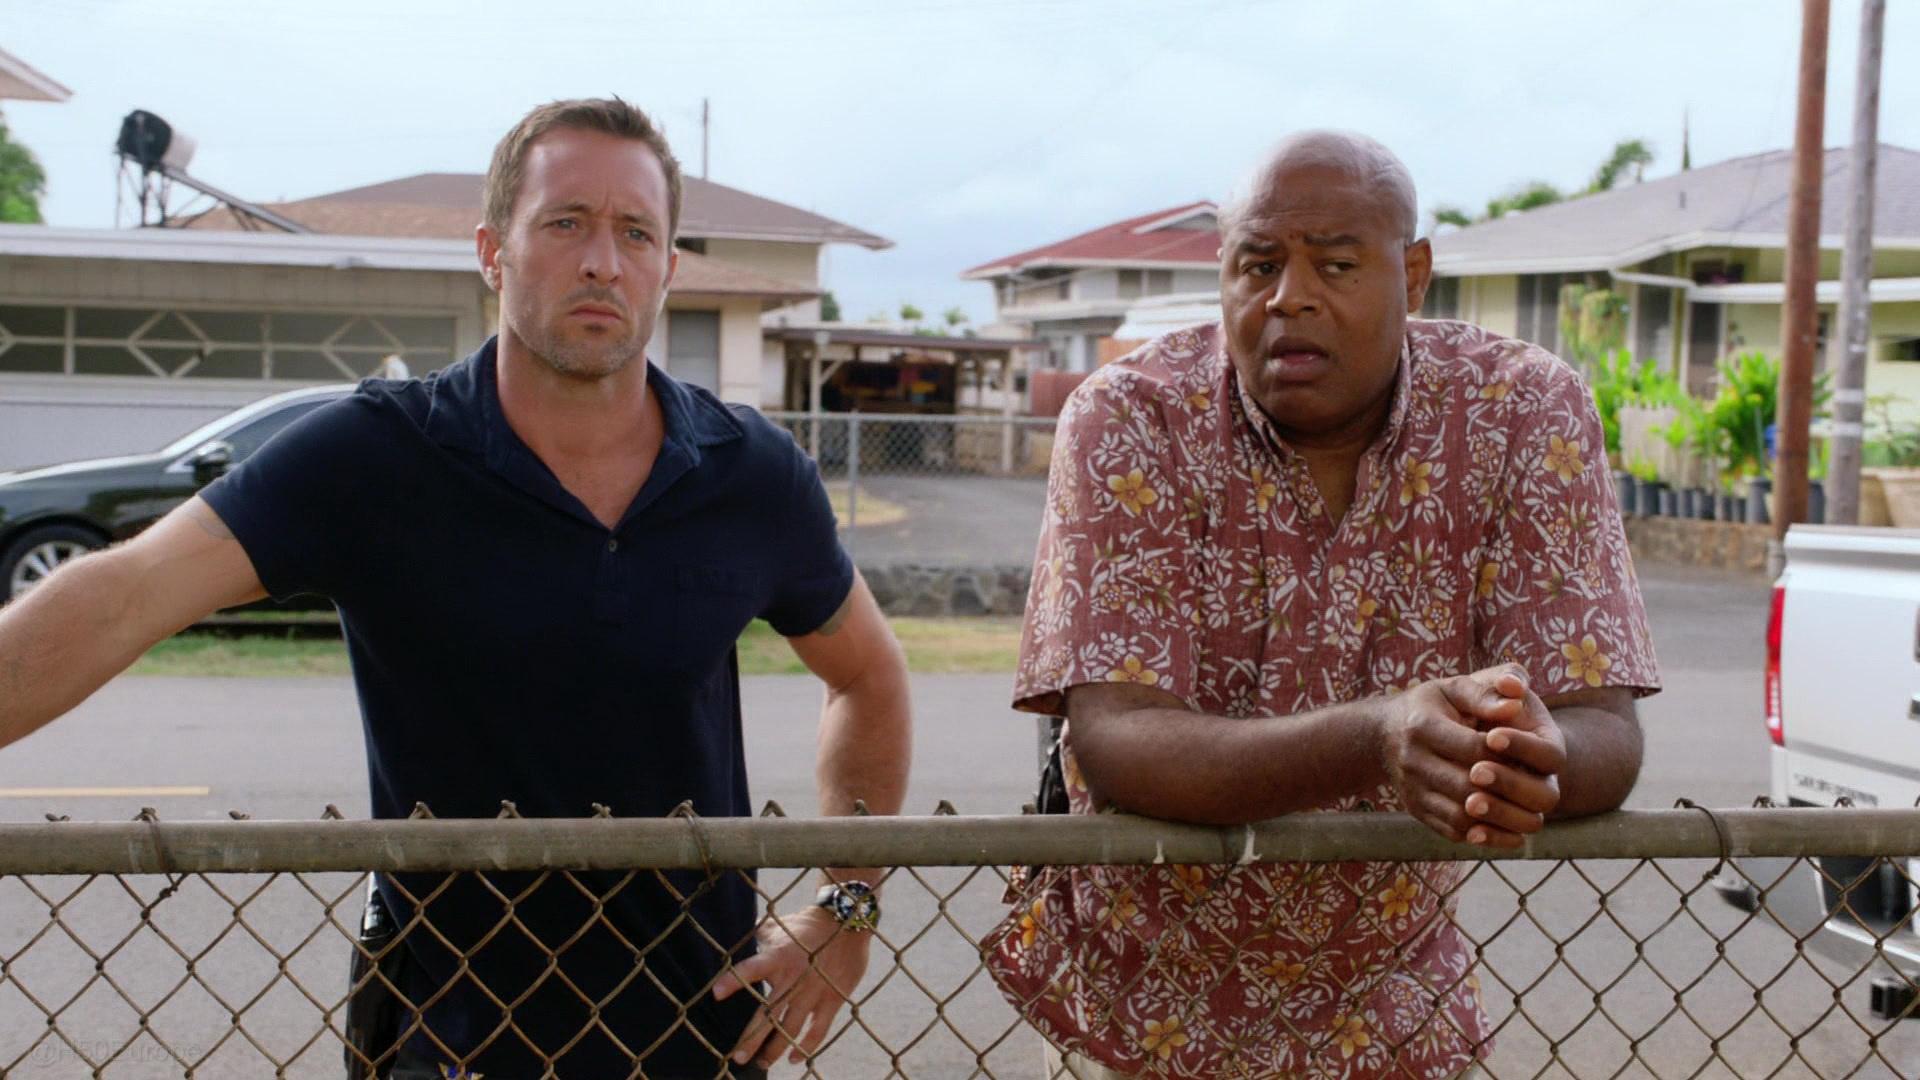 Hawaii Five-0 8.02 HQ Screencaps